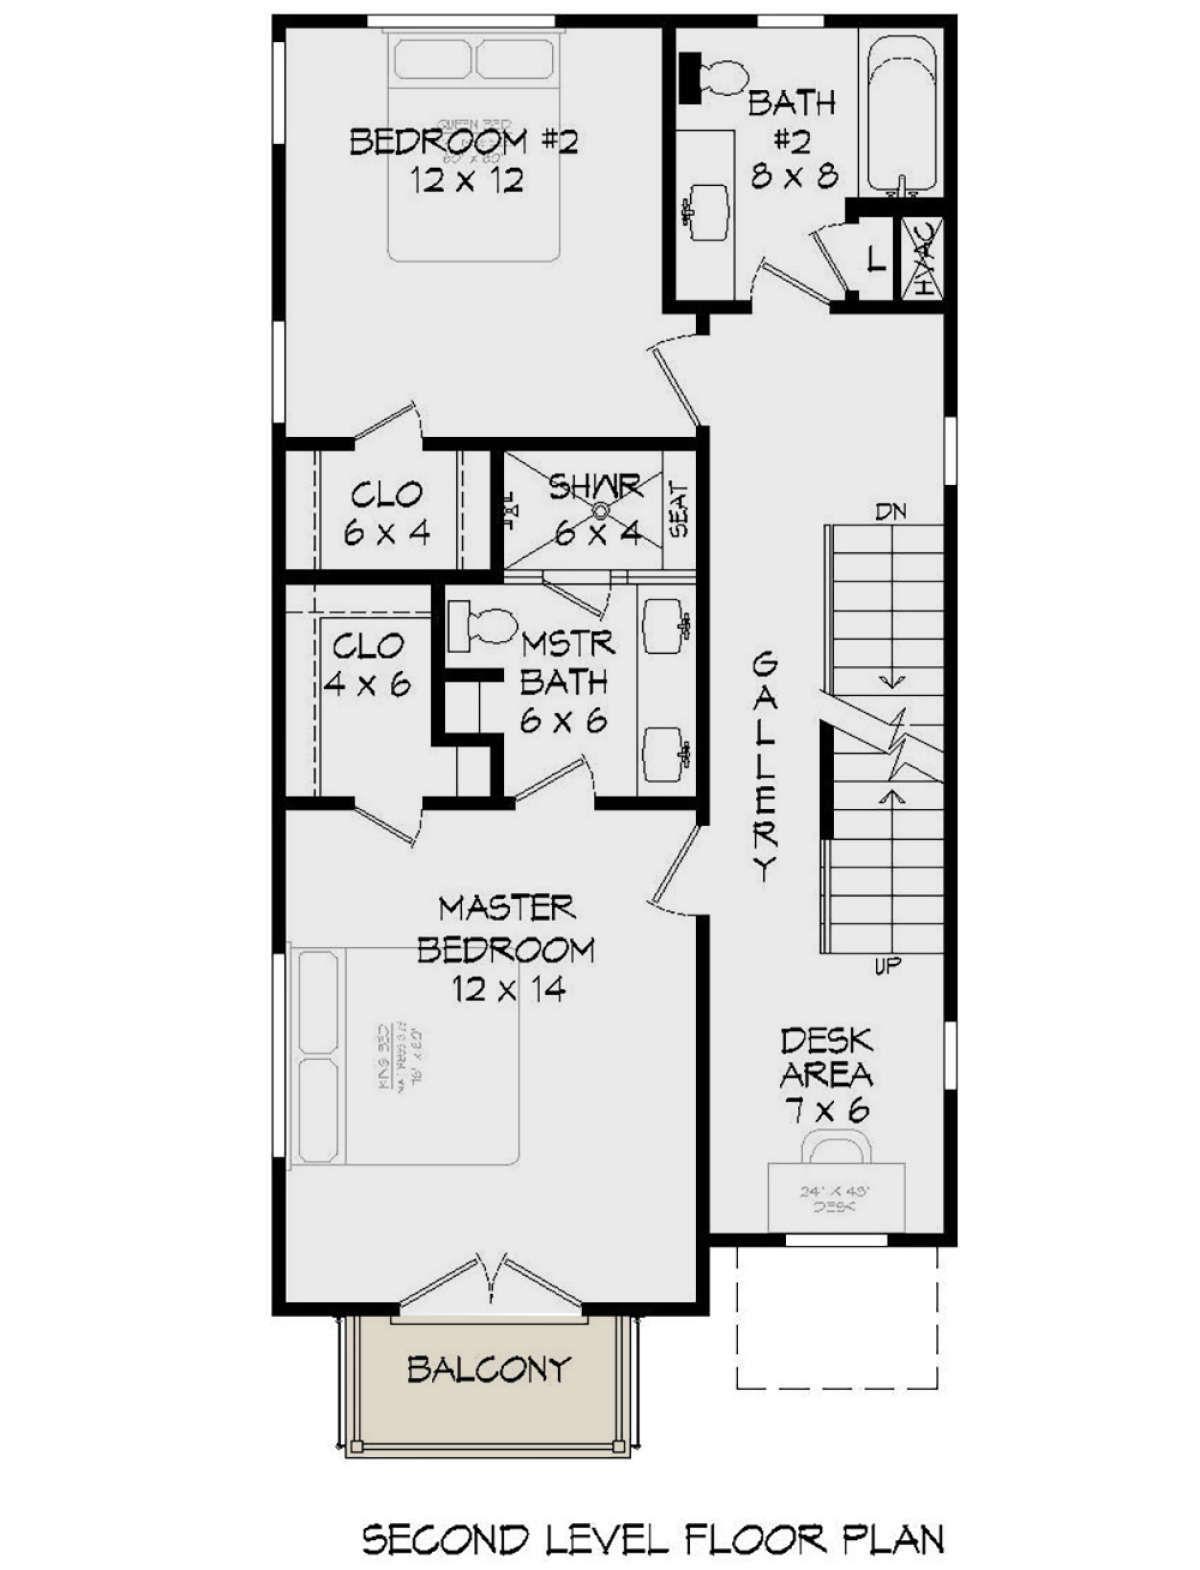 Modern Plan: 1,834 Square Feet, 2 Bedrooms, 3 Bathrooms - 940-00165